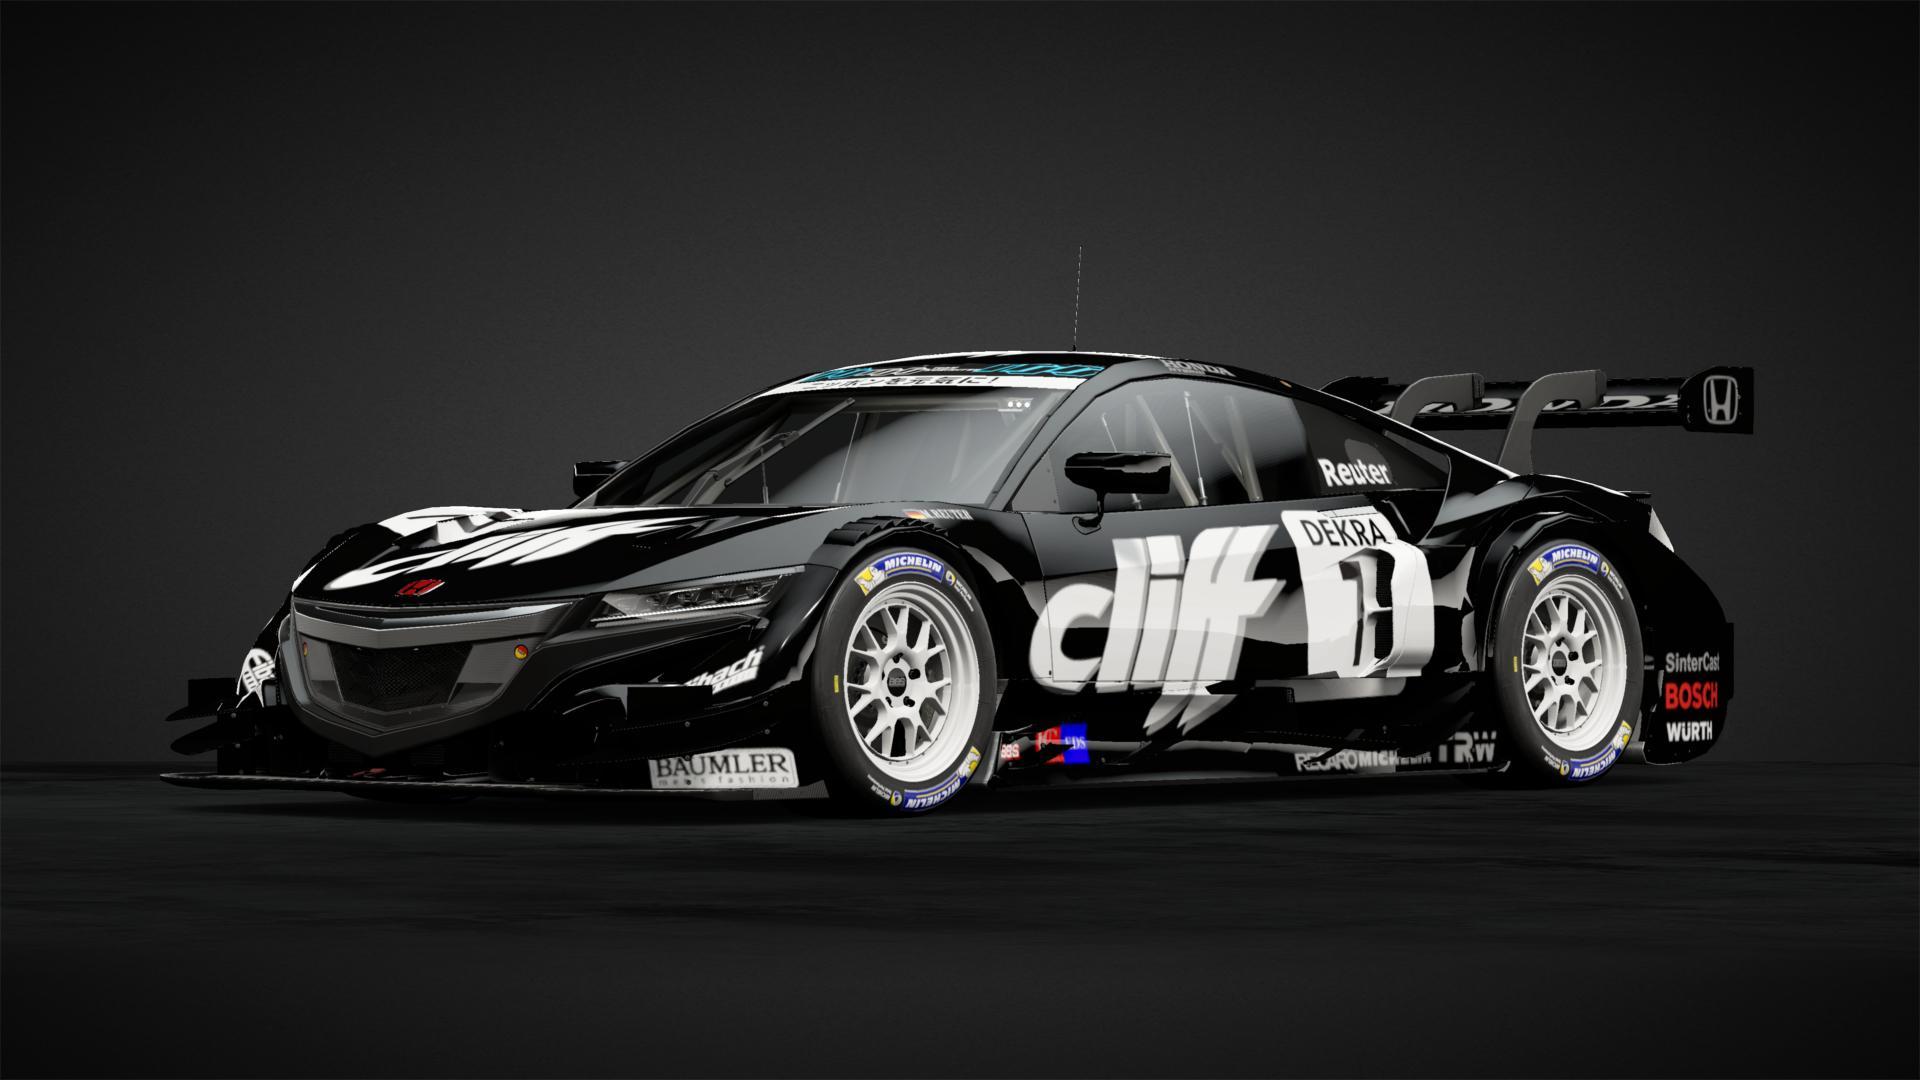 Cliff Calibra Nsx Car Livery By Sgebi Community Gran Turismo Sport